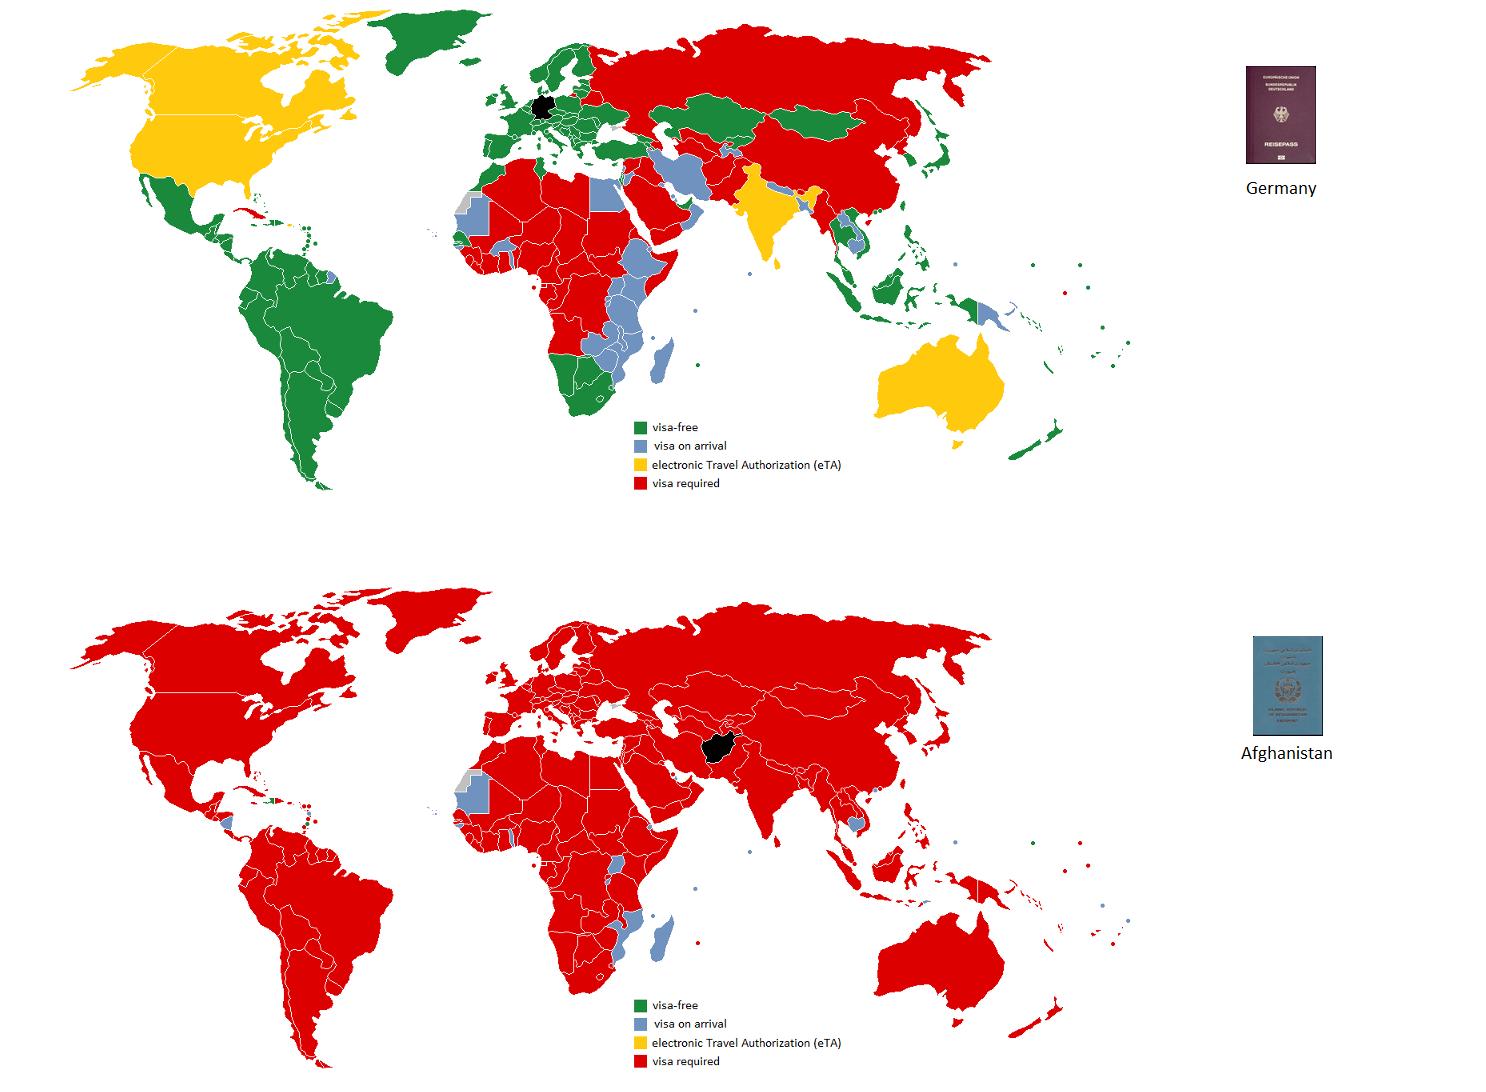 German passport vs. Afghan passport